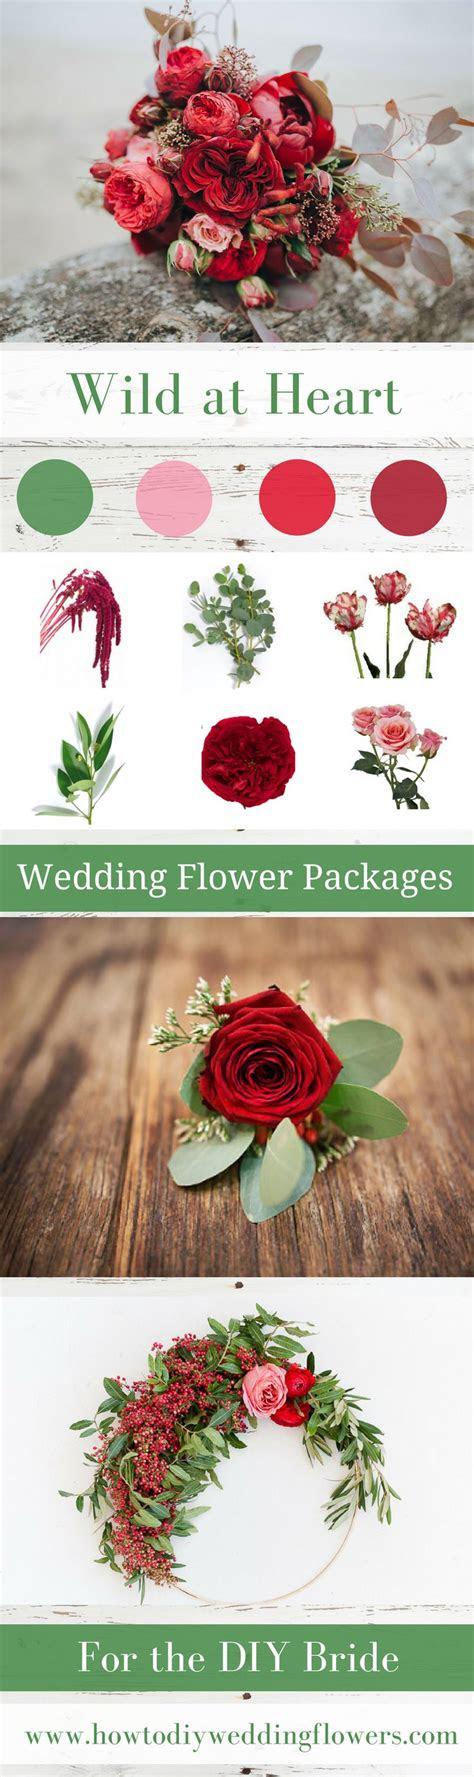 images  budget wedding ideas tips  pinterest